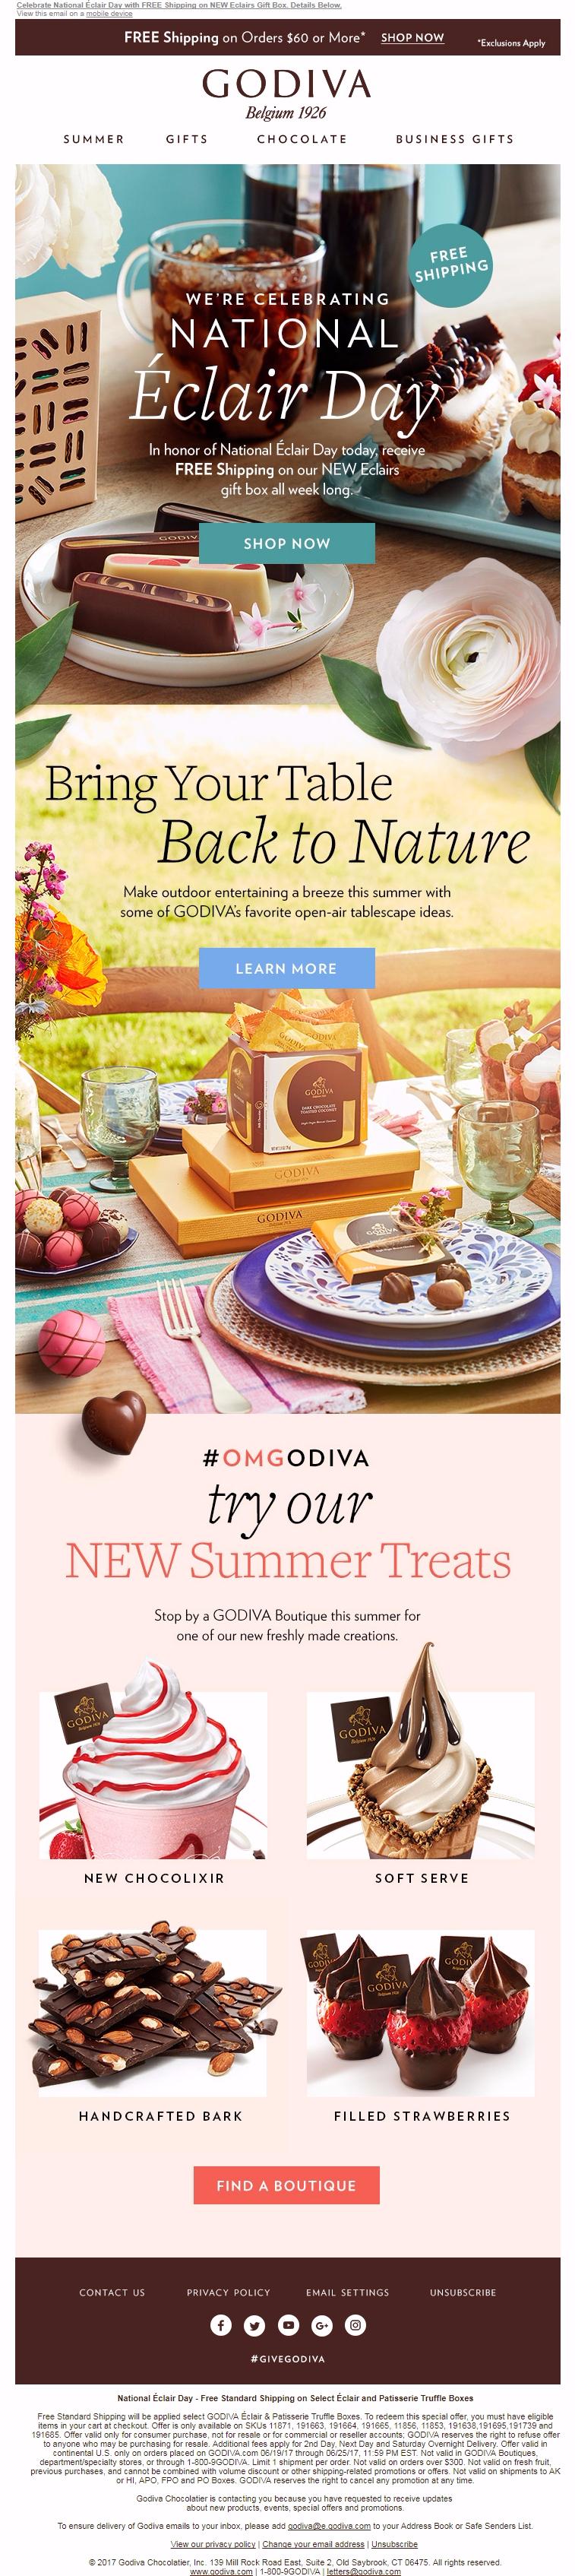 GoDiva - Email inspiration